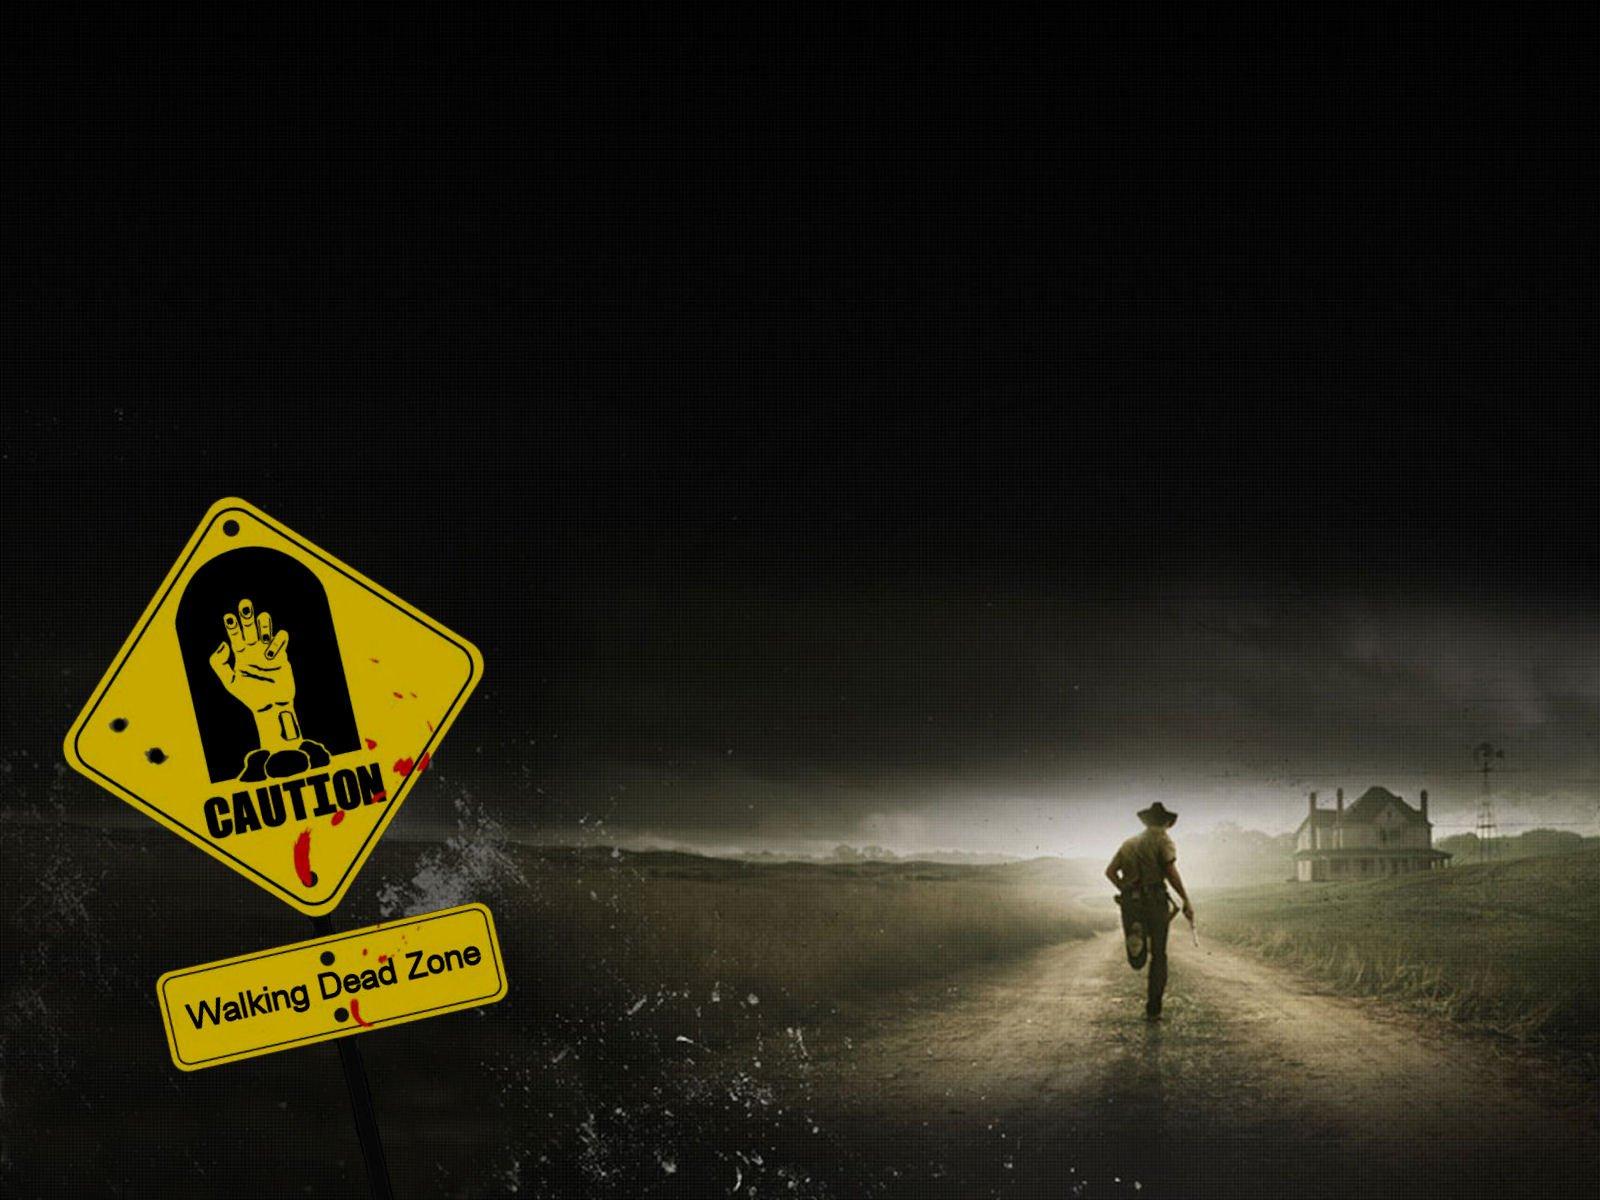 2014 Walking Dead Wallpaper IPhone 13207 Wallpaper Wallpaper Screen 1600x1200